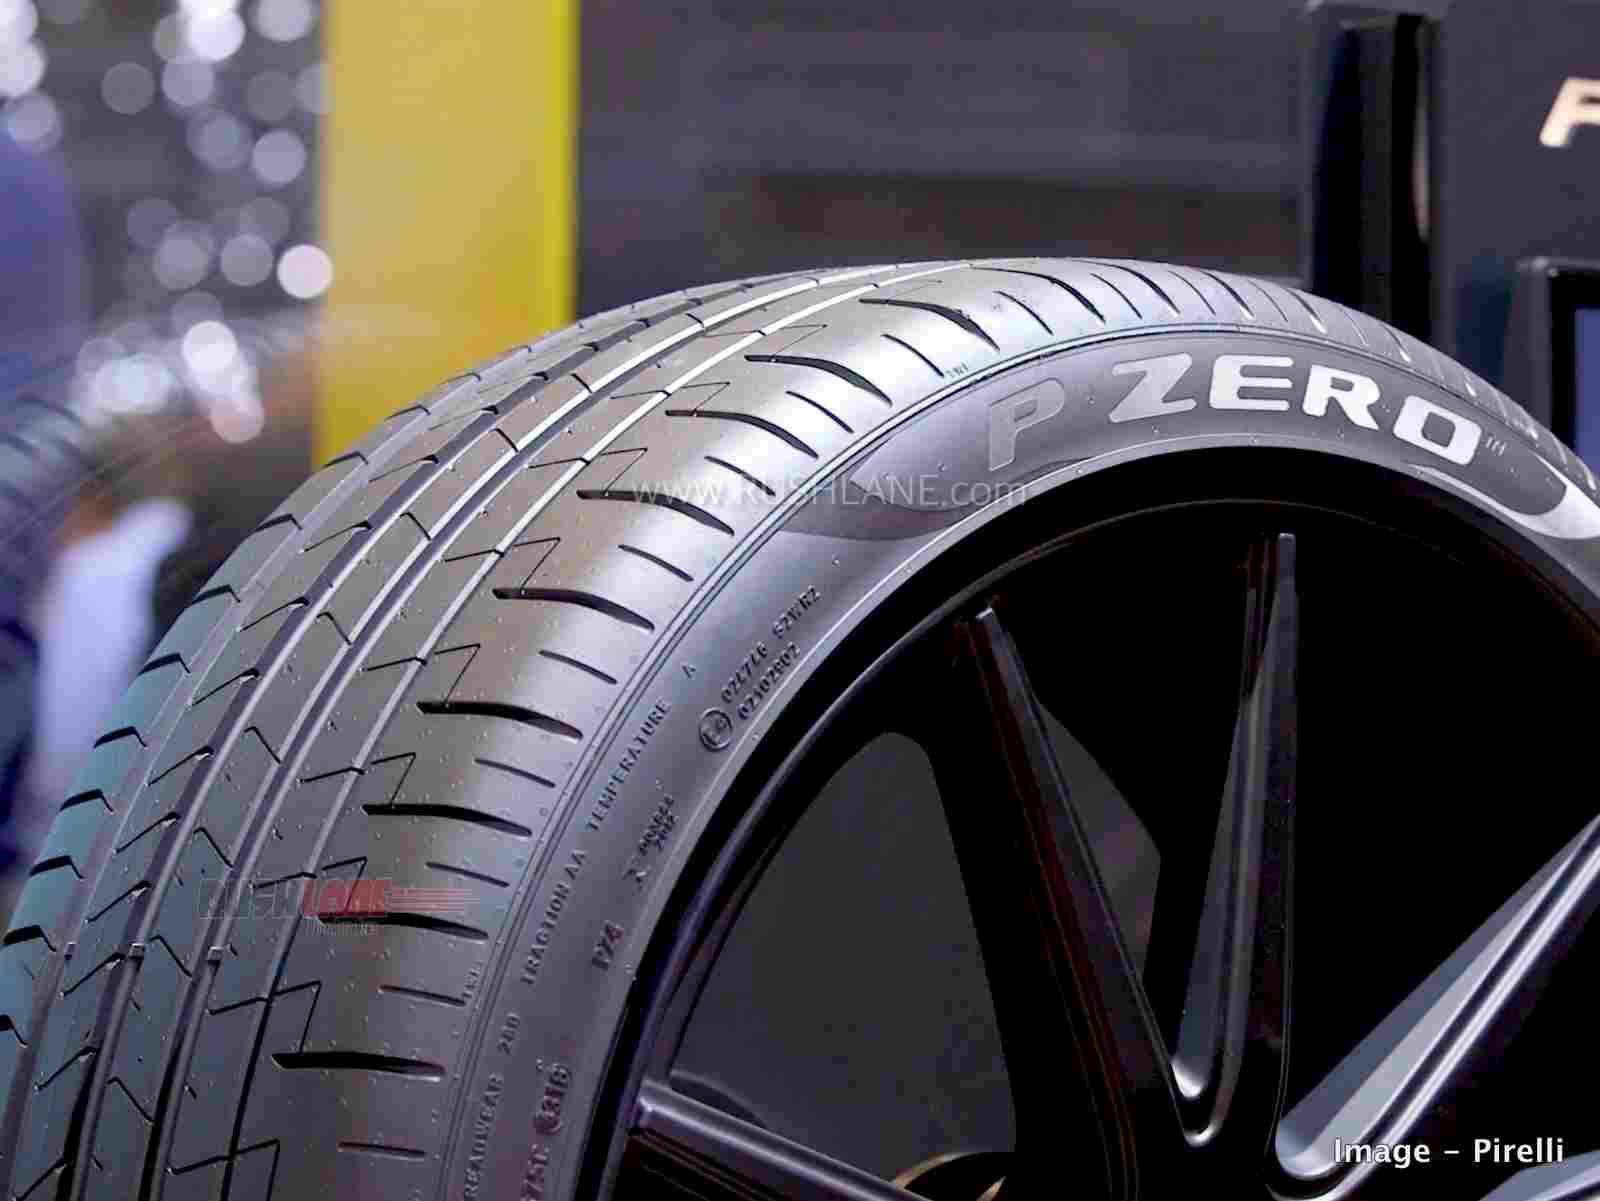 Pirelli 5g tyre cyber